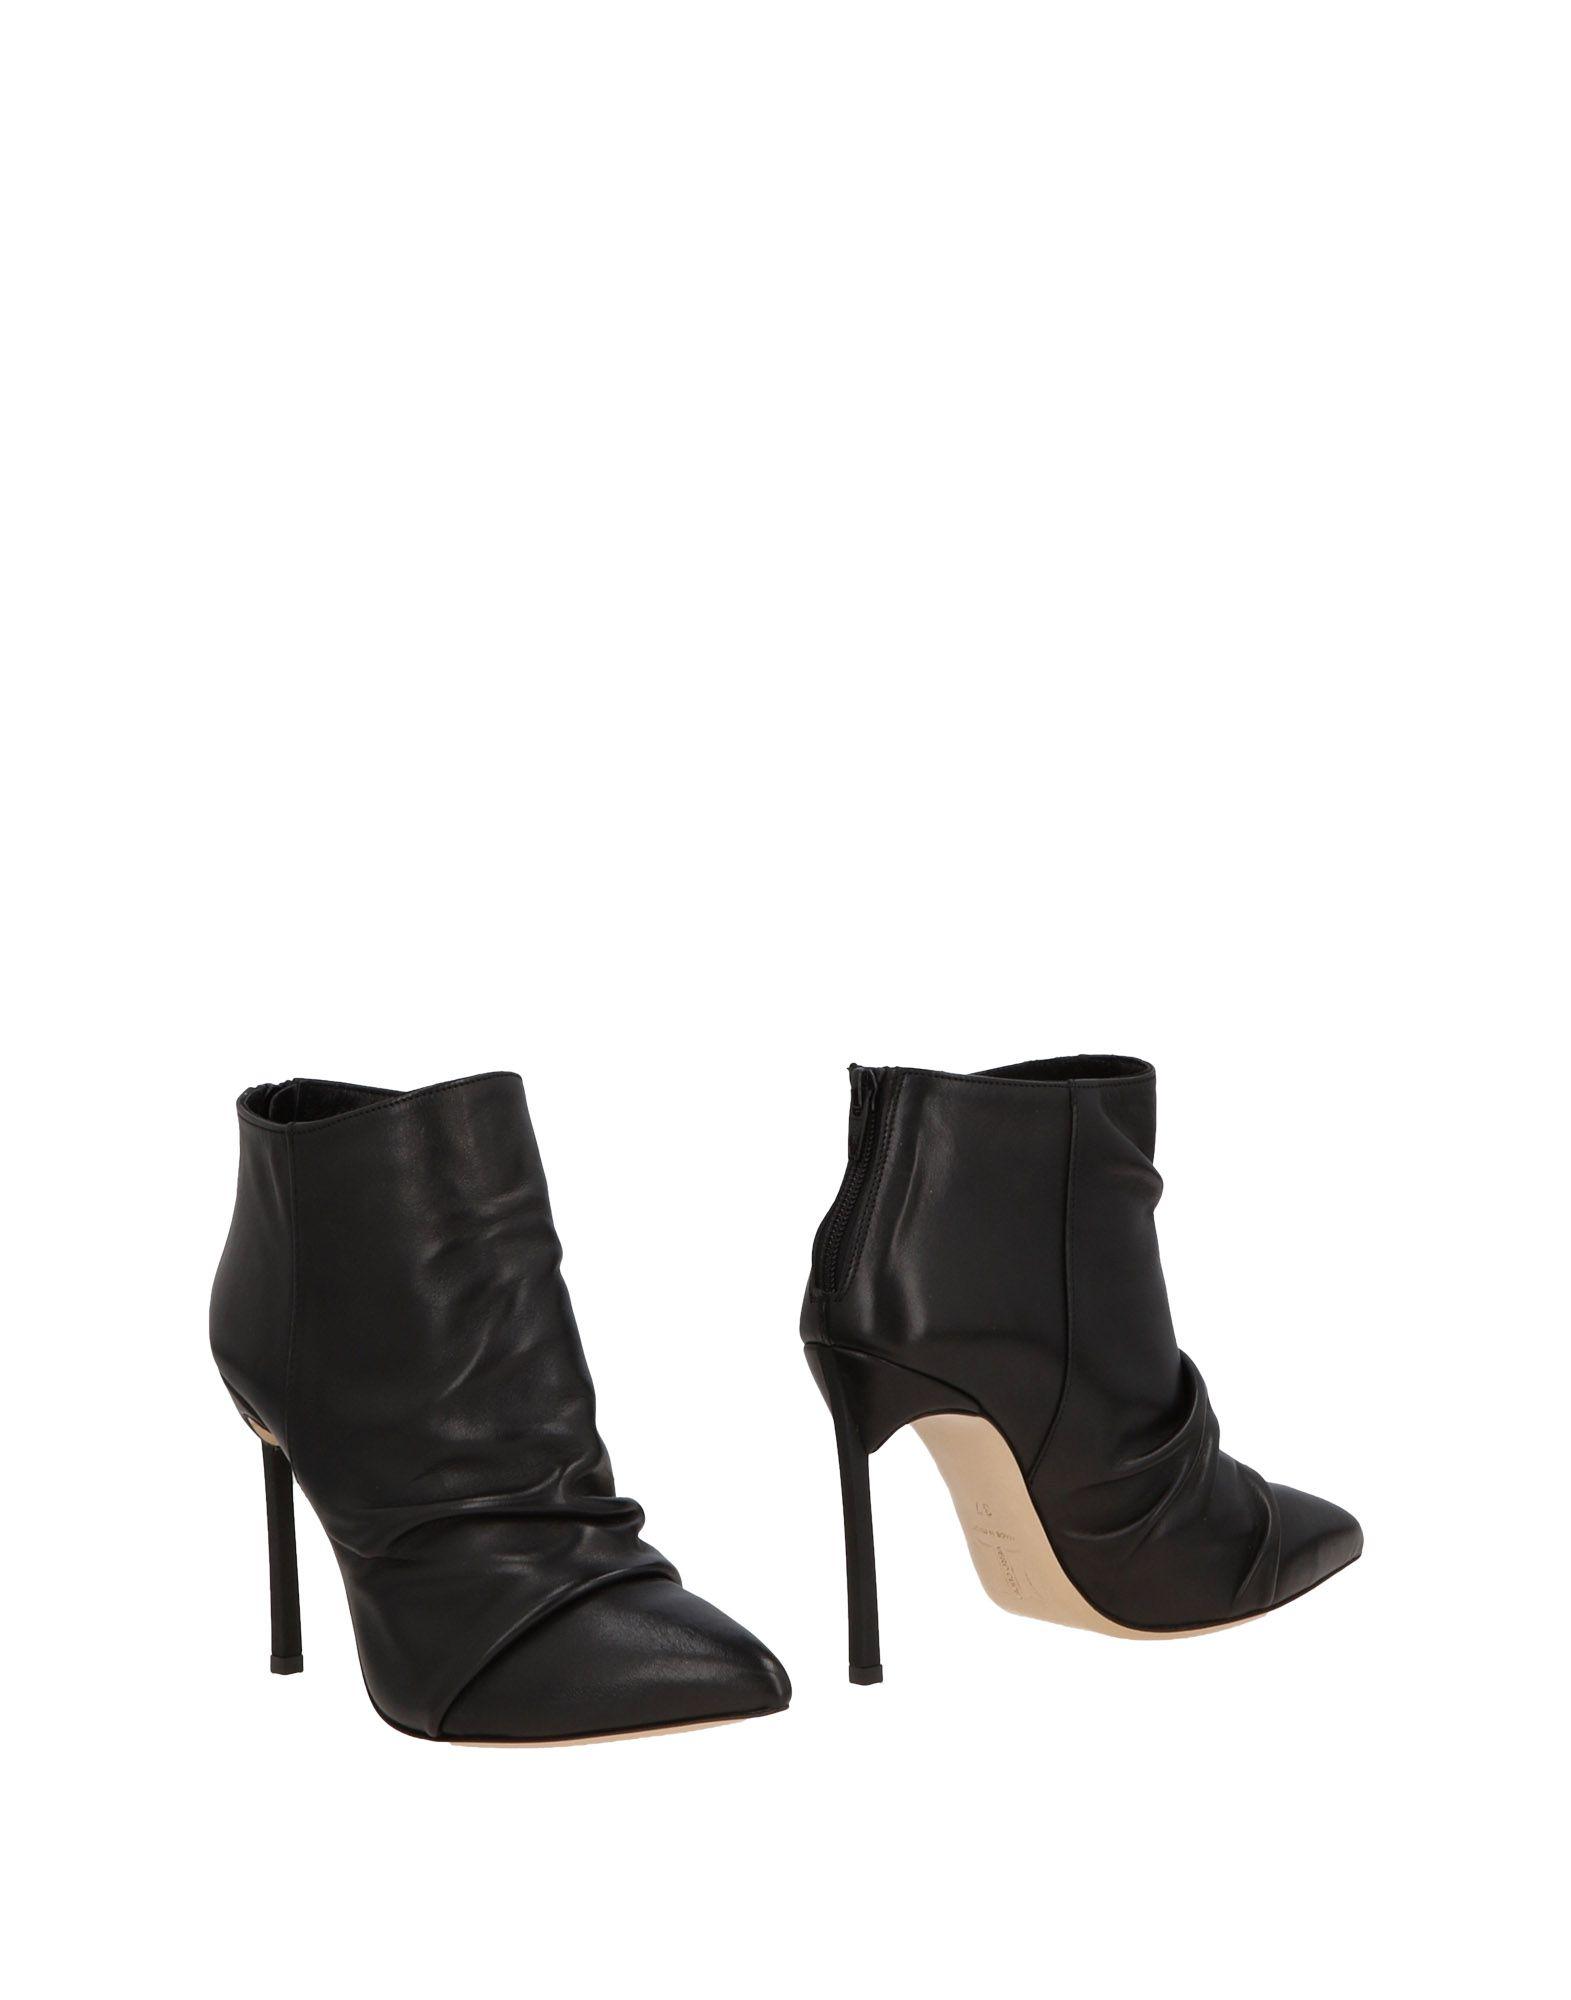 NILA & NILA Полусапоги и высокие ботинки полусапоги nila nila полусапоги